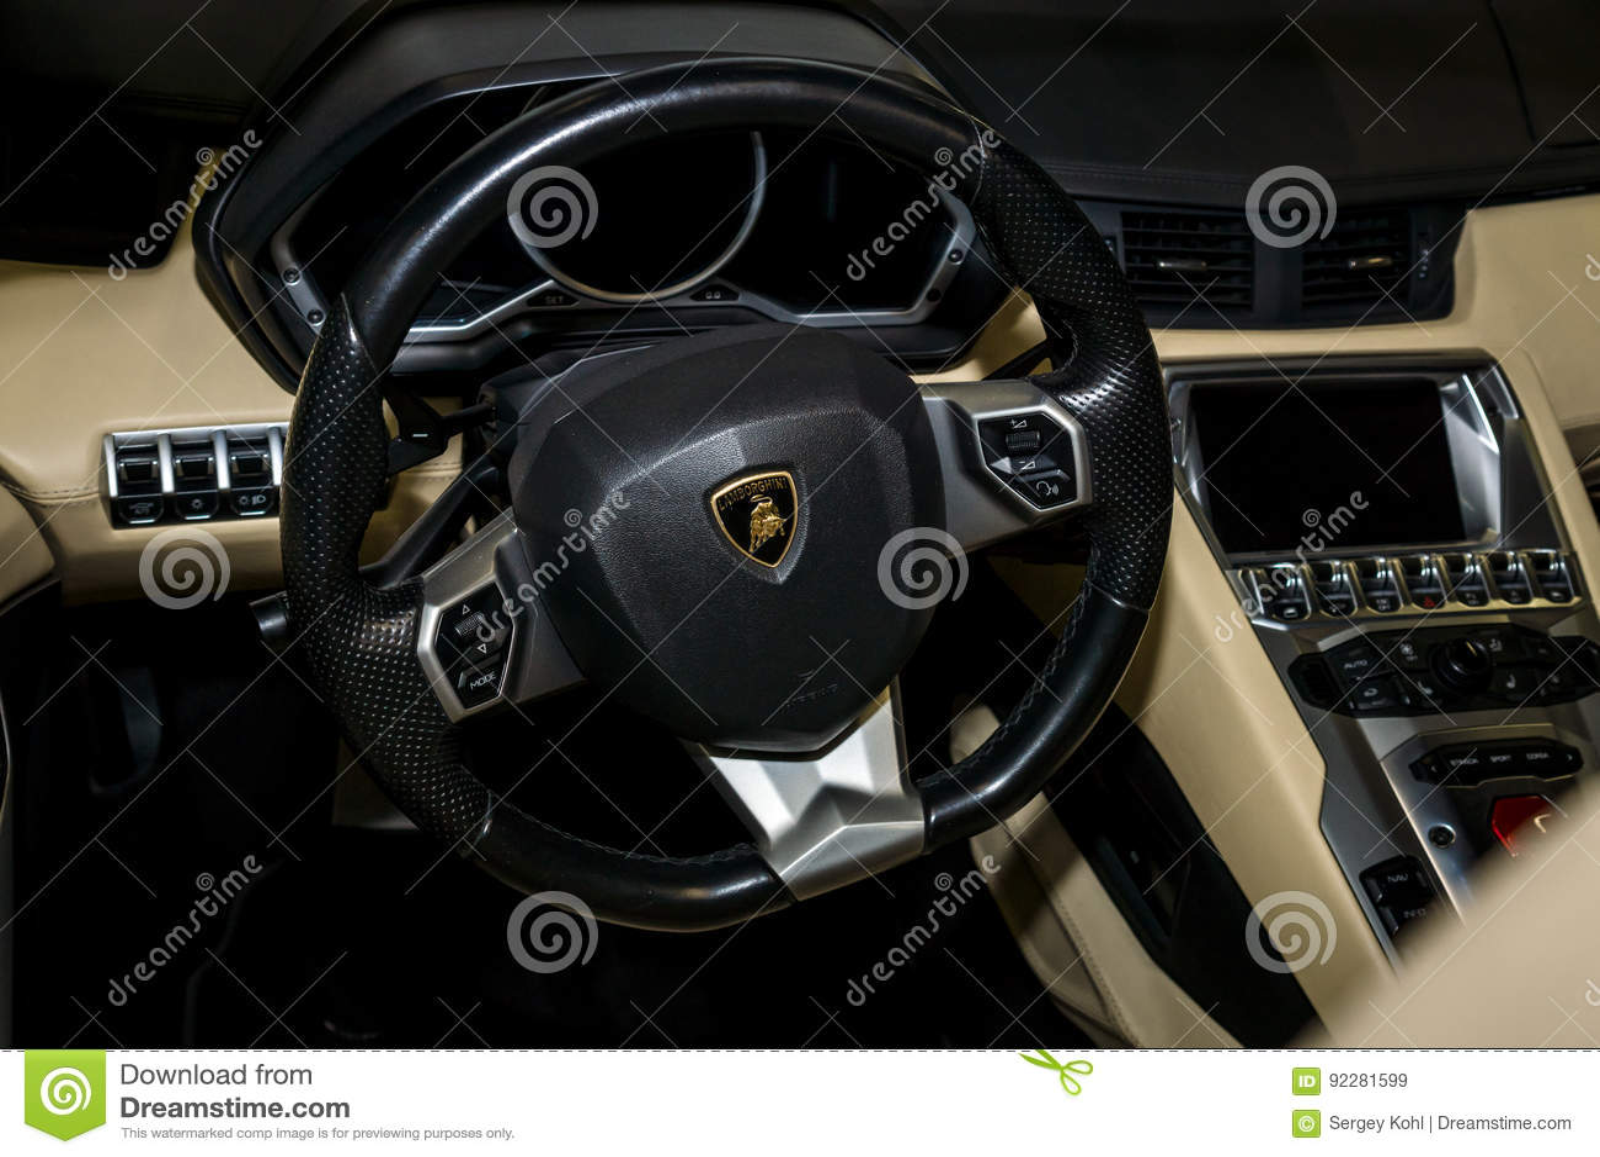 Interior Of Lamborghini Aventador. Editorial Stock Image - Image of ...